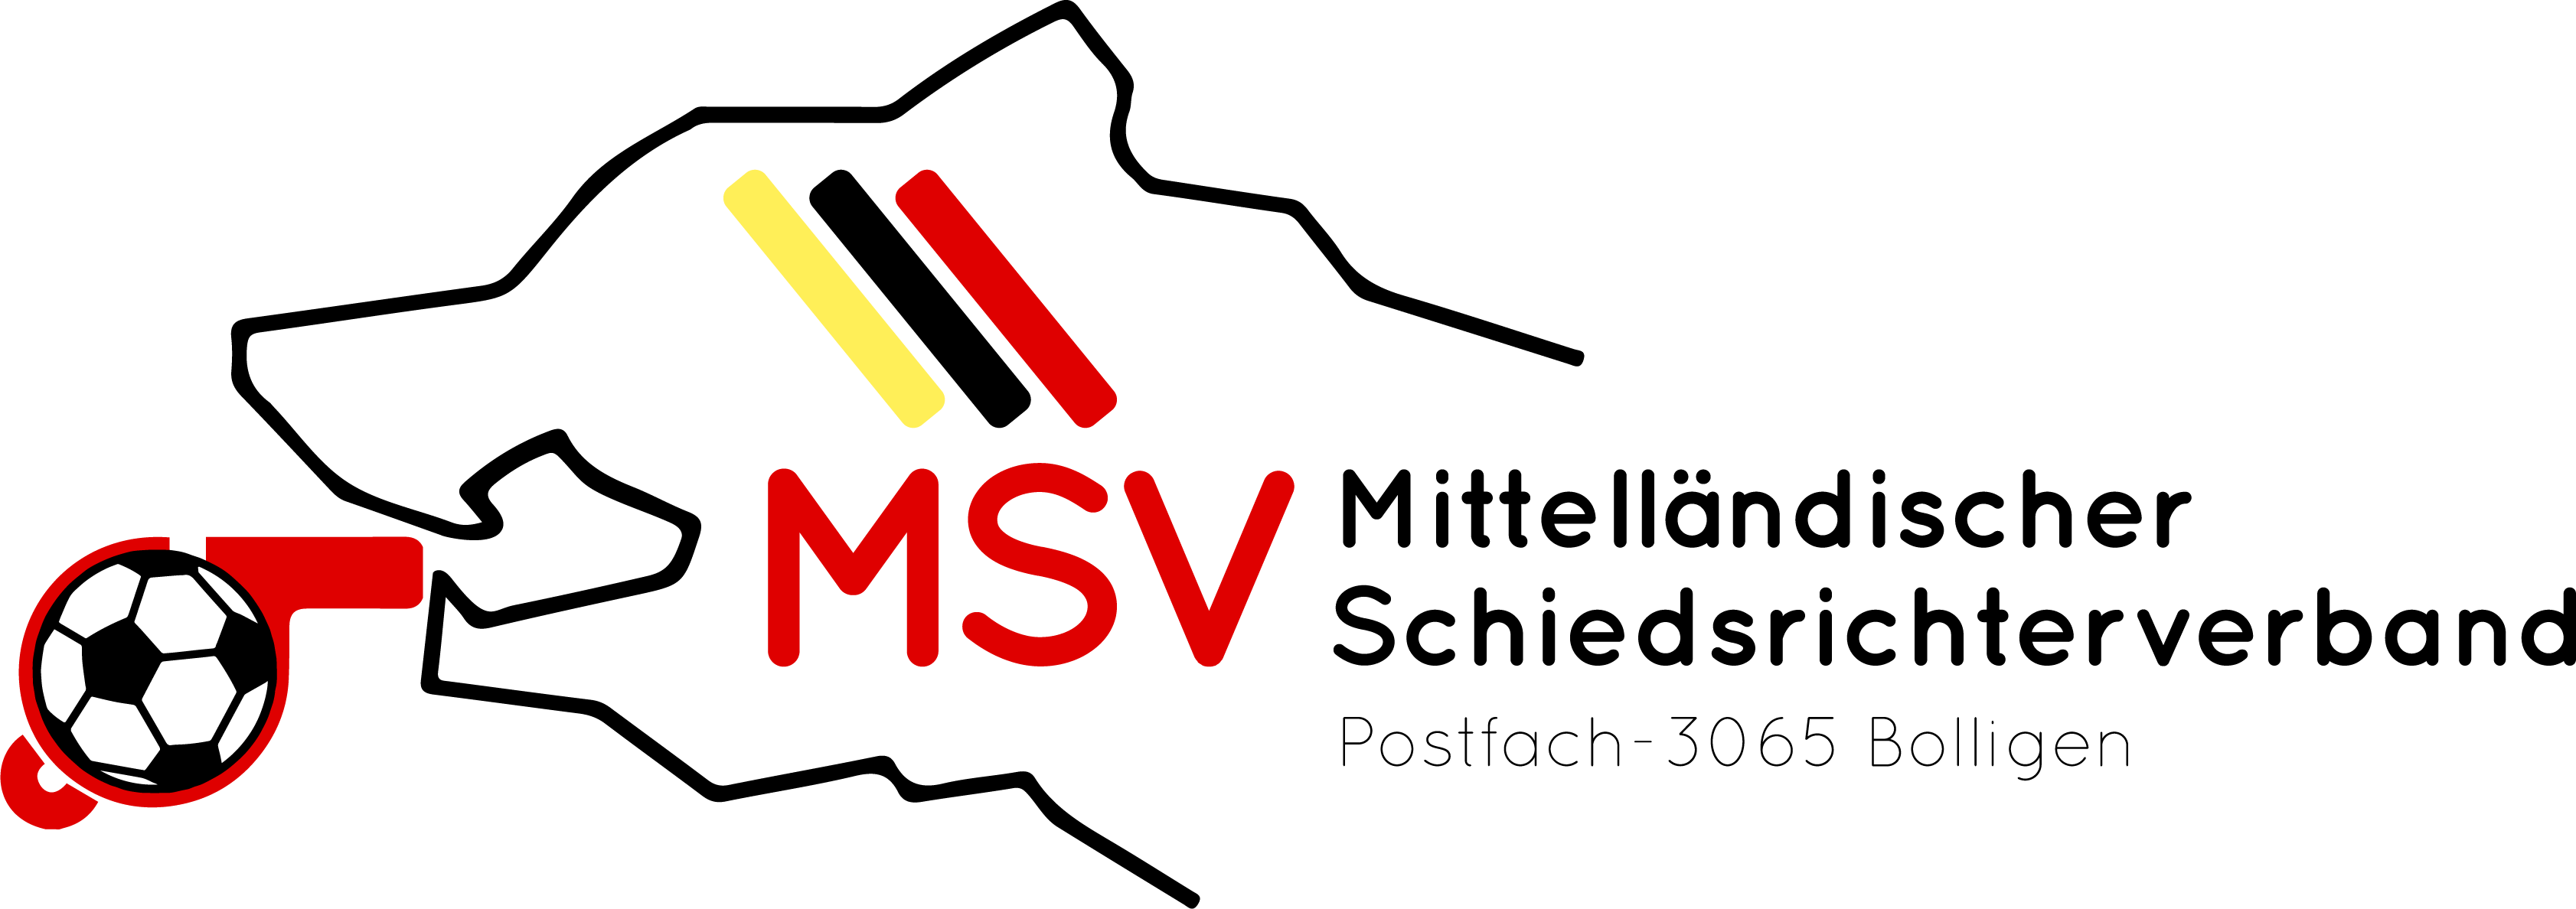 MSV Bern